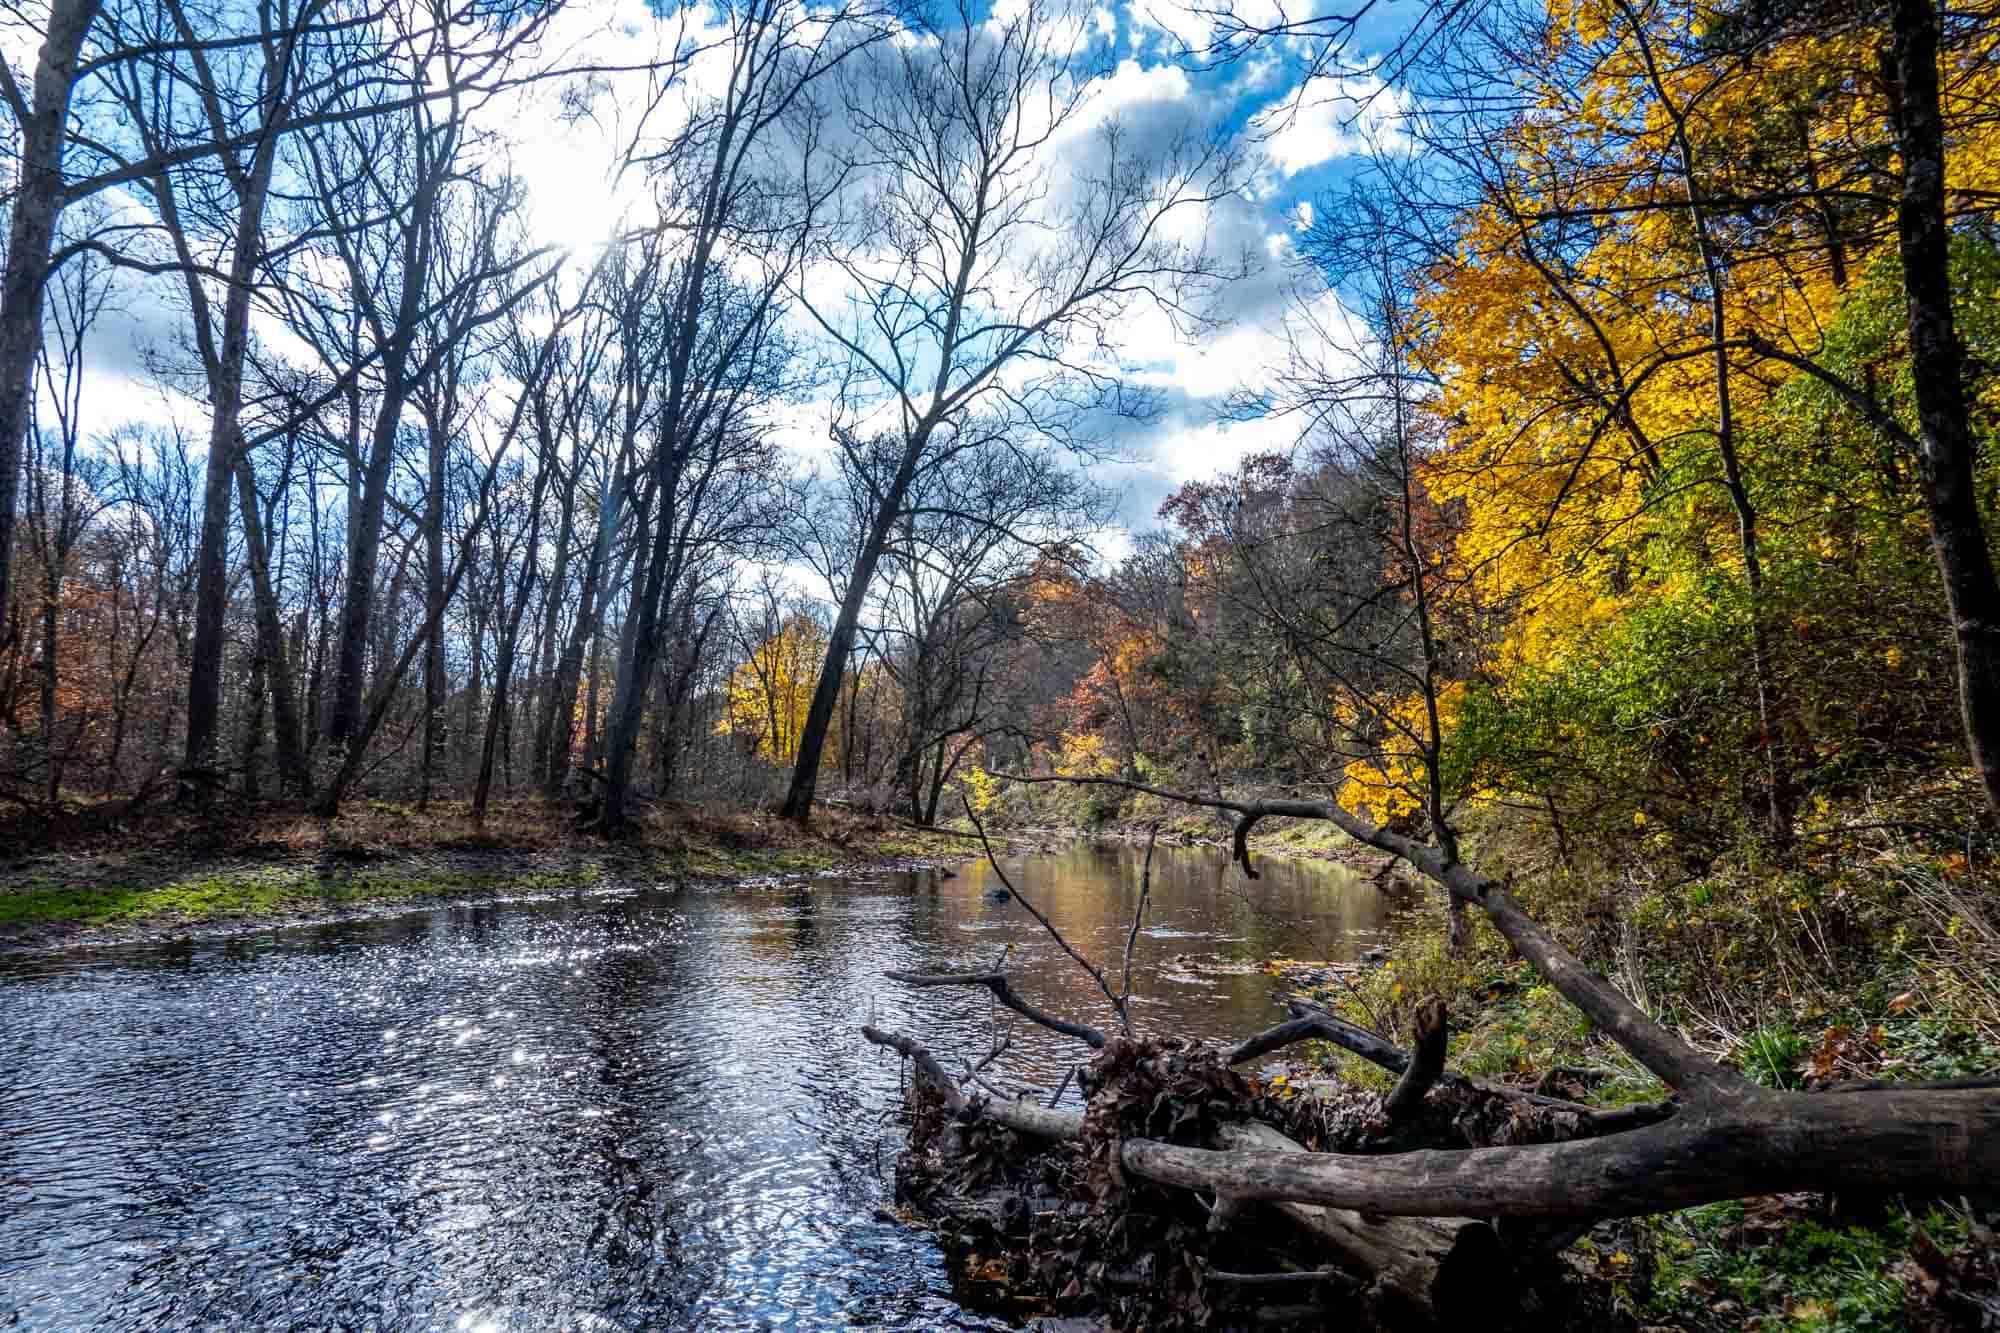 Creek flowing through state park